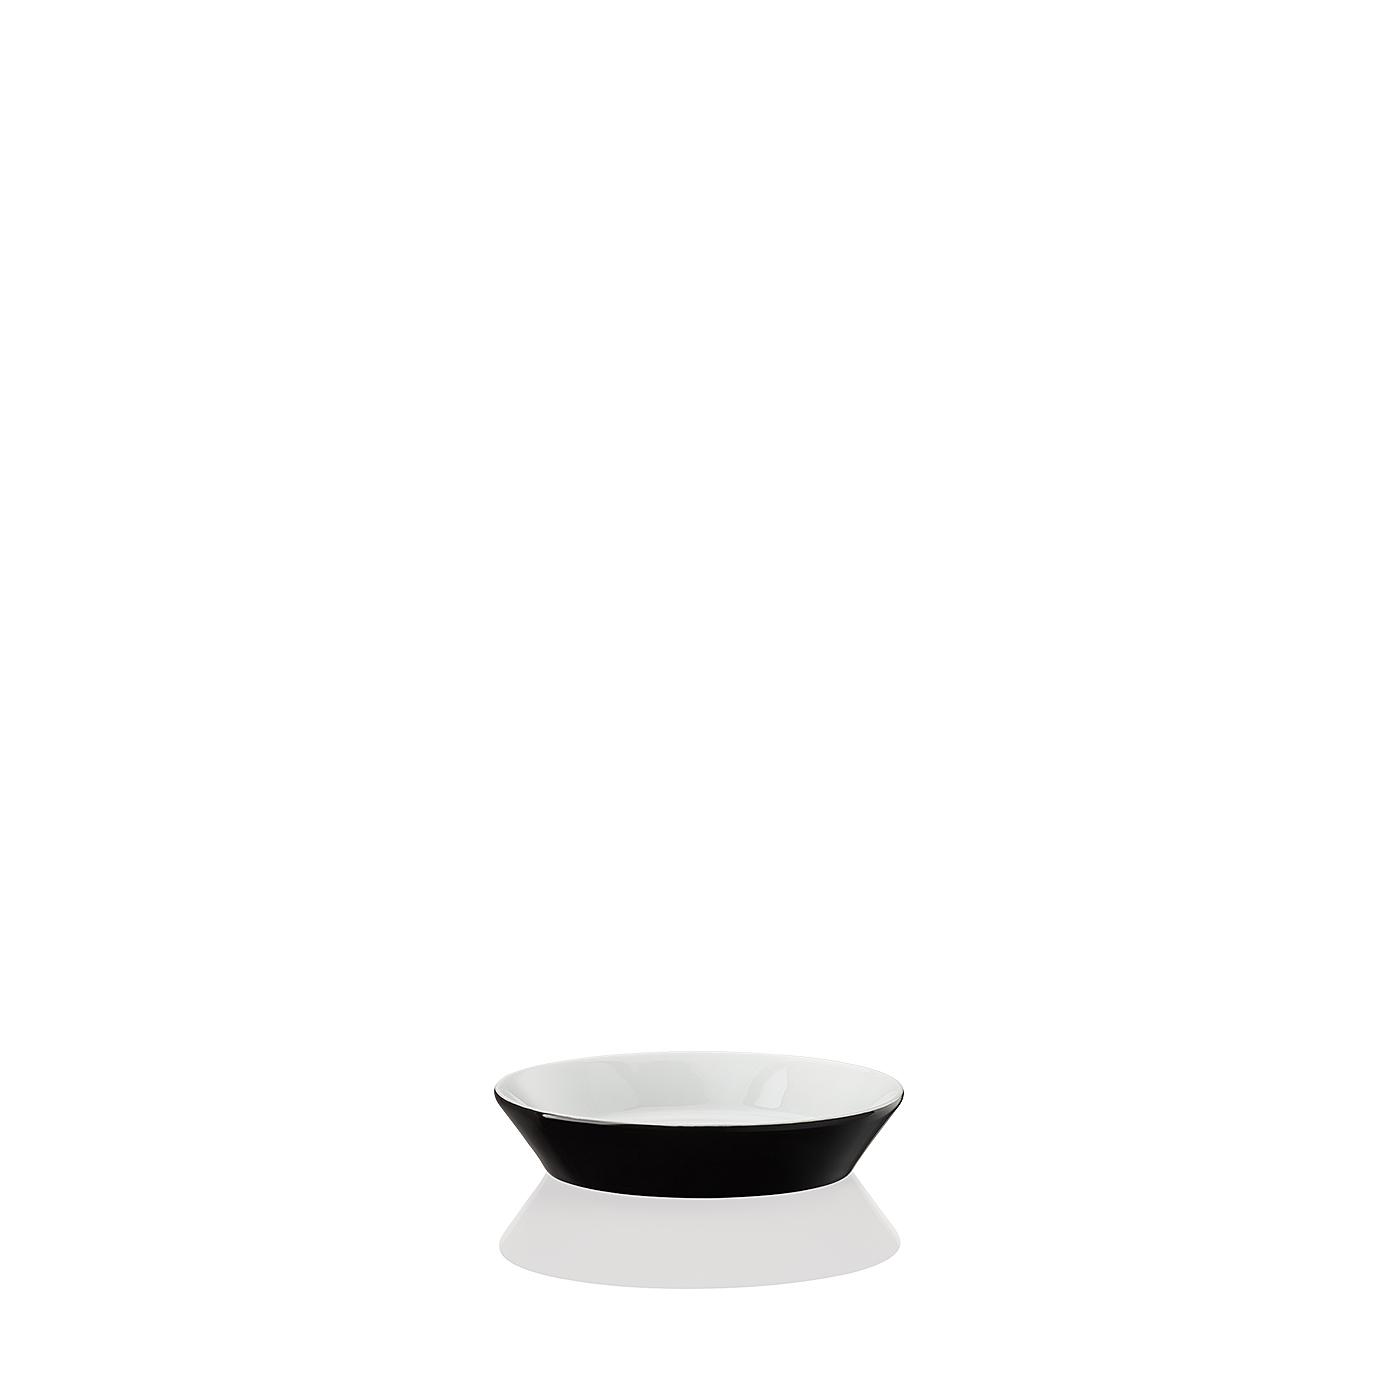 Espresso-/Mokka-Untertasse Tric Monochrome Arzberg